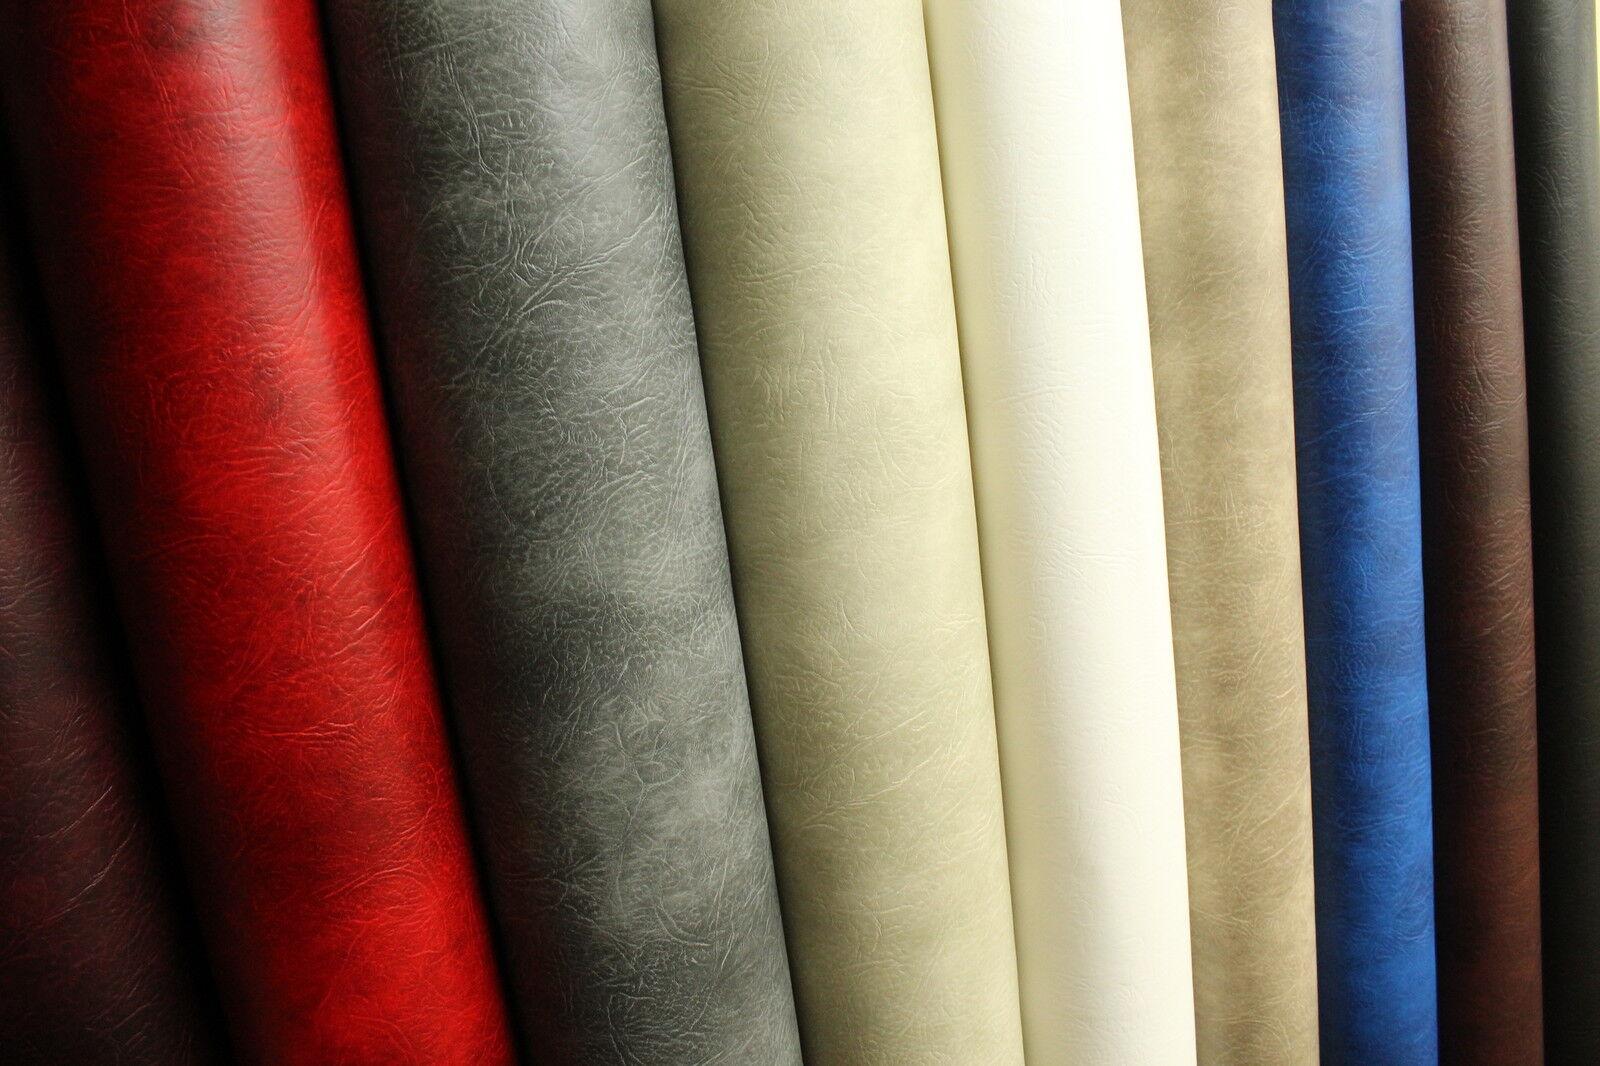 High Gloss Glitter Vinyl Leatherette Fabric Material Sparkle Plastic PVC Cover